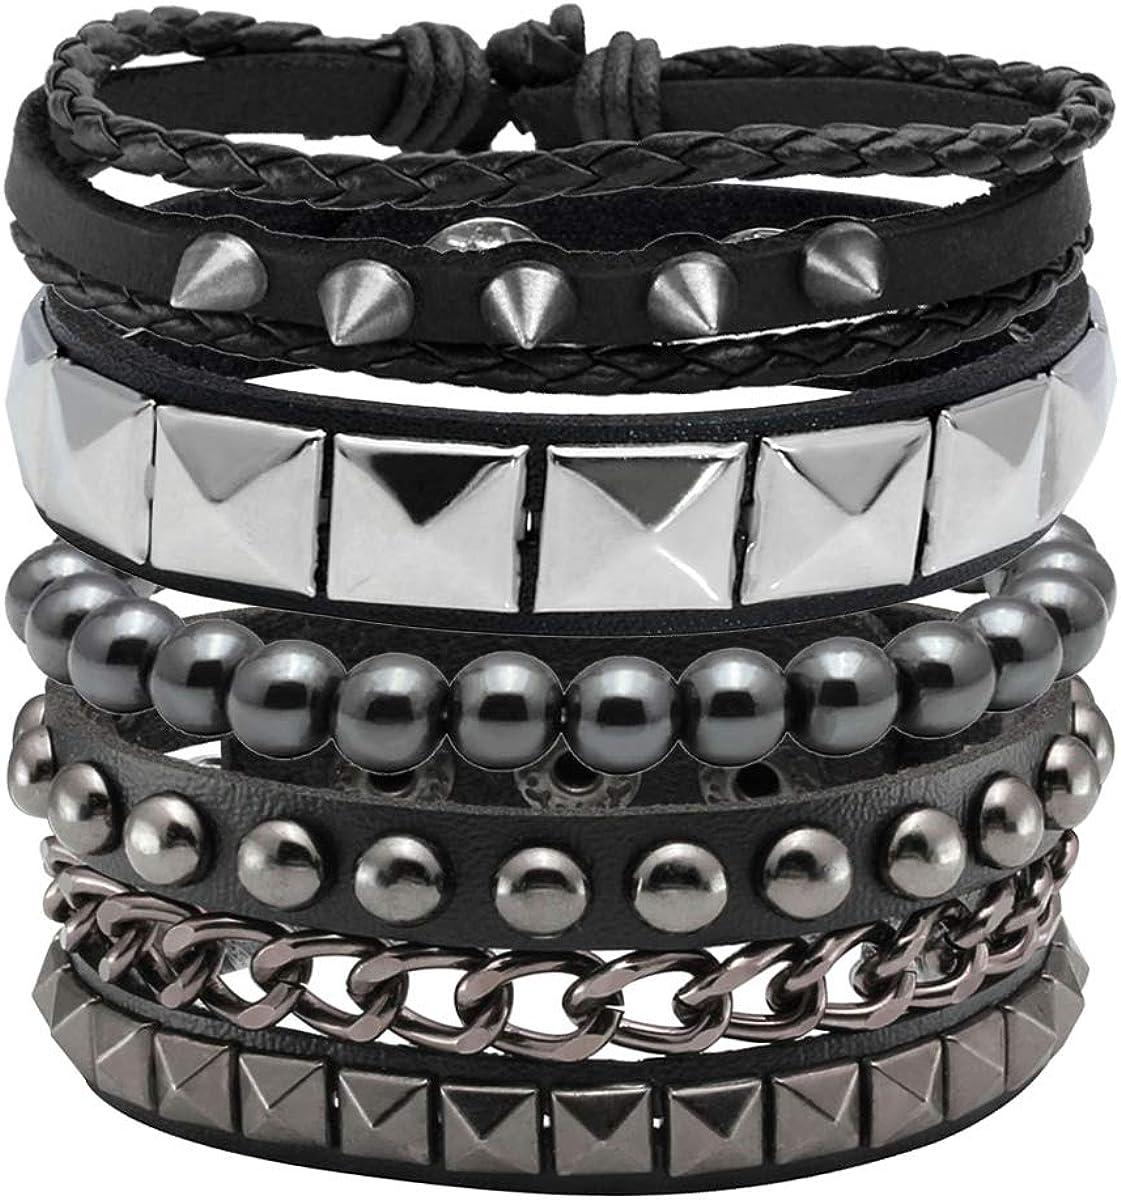 Eigso Black Leather Bracelet for Men Women Adjustable Hematite Punk Spike Metal Cuff Bangle